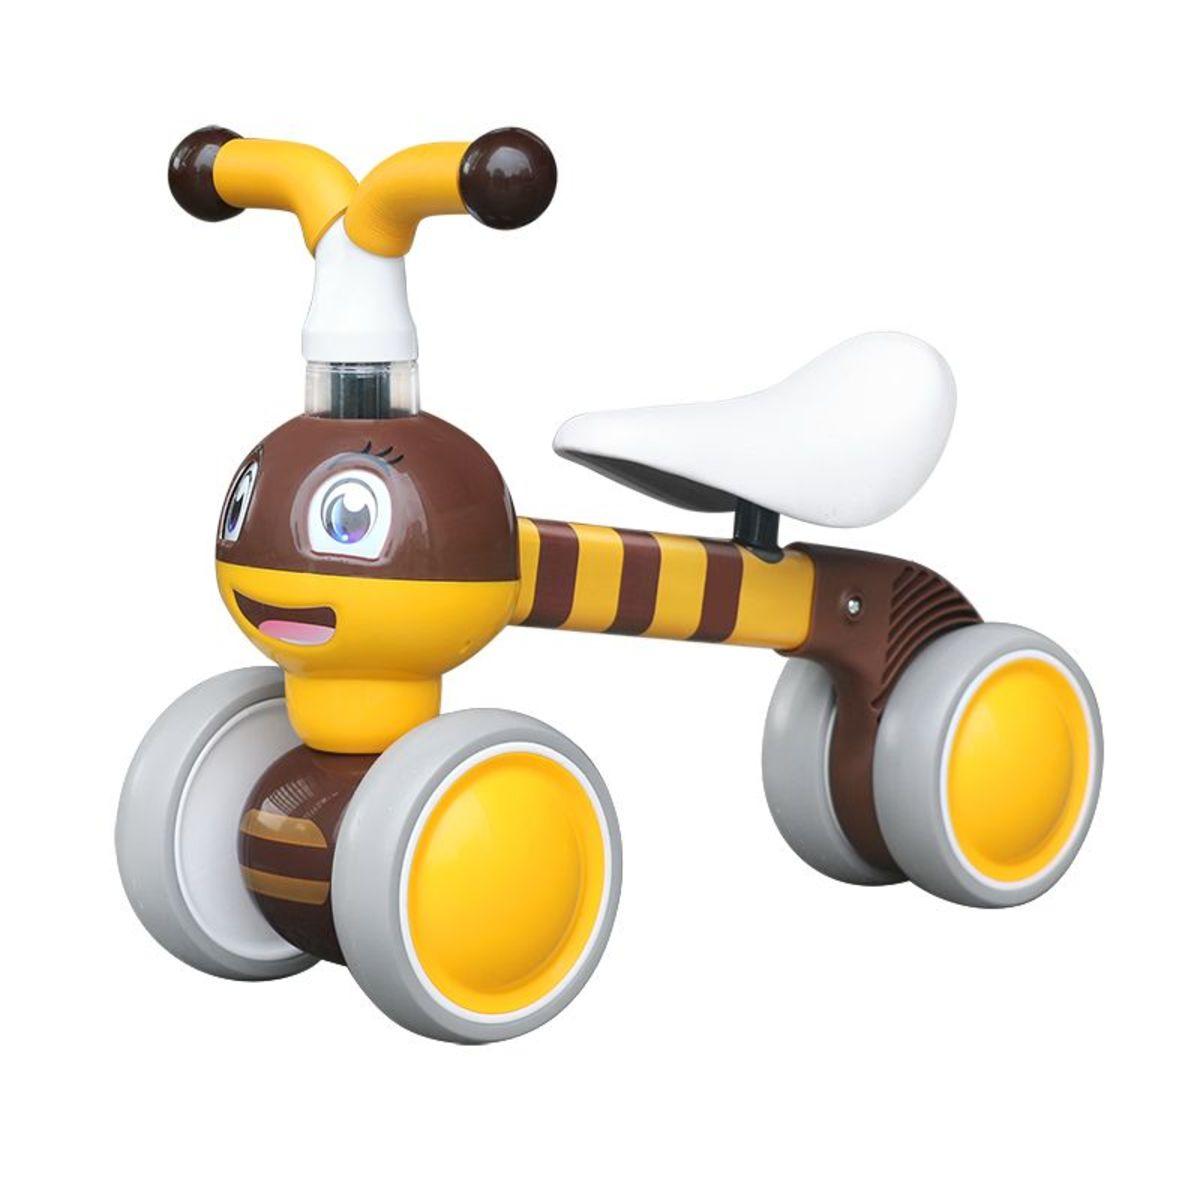 Detské odrážadlo Včielka - žlto-hnedé yellow bee